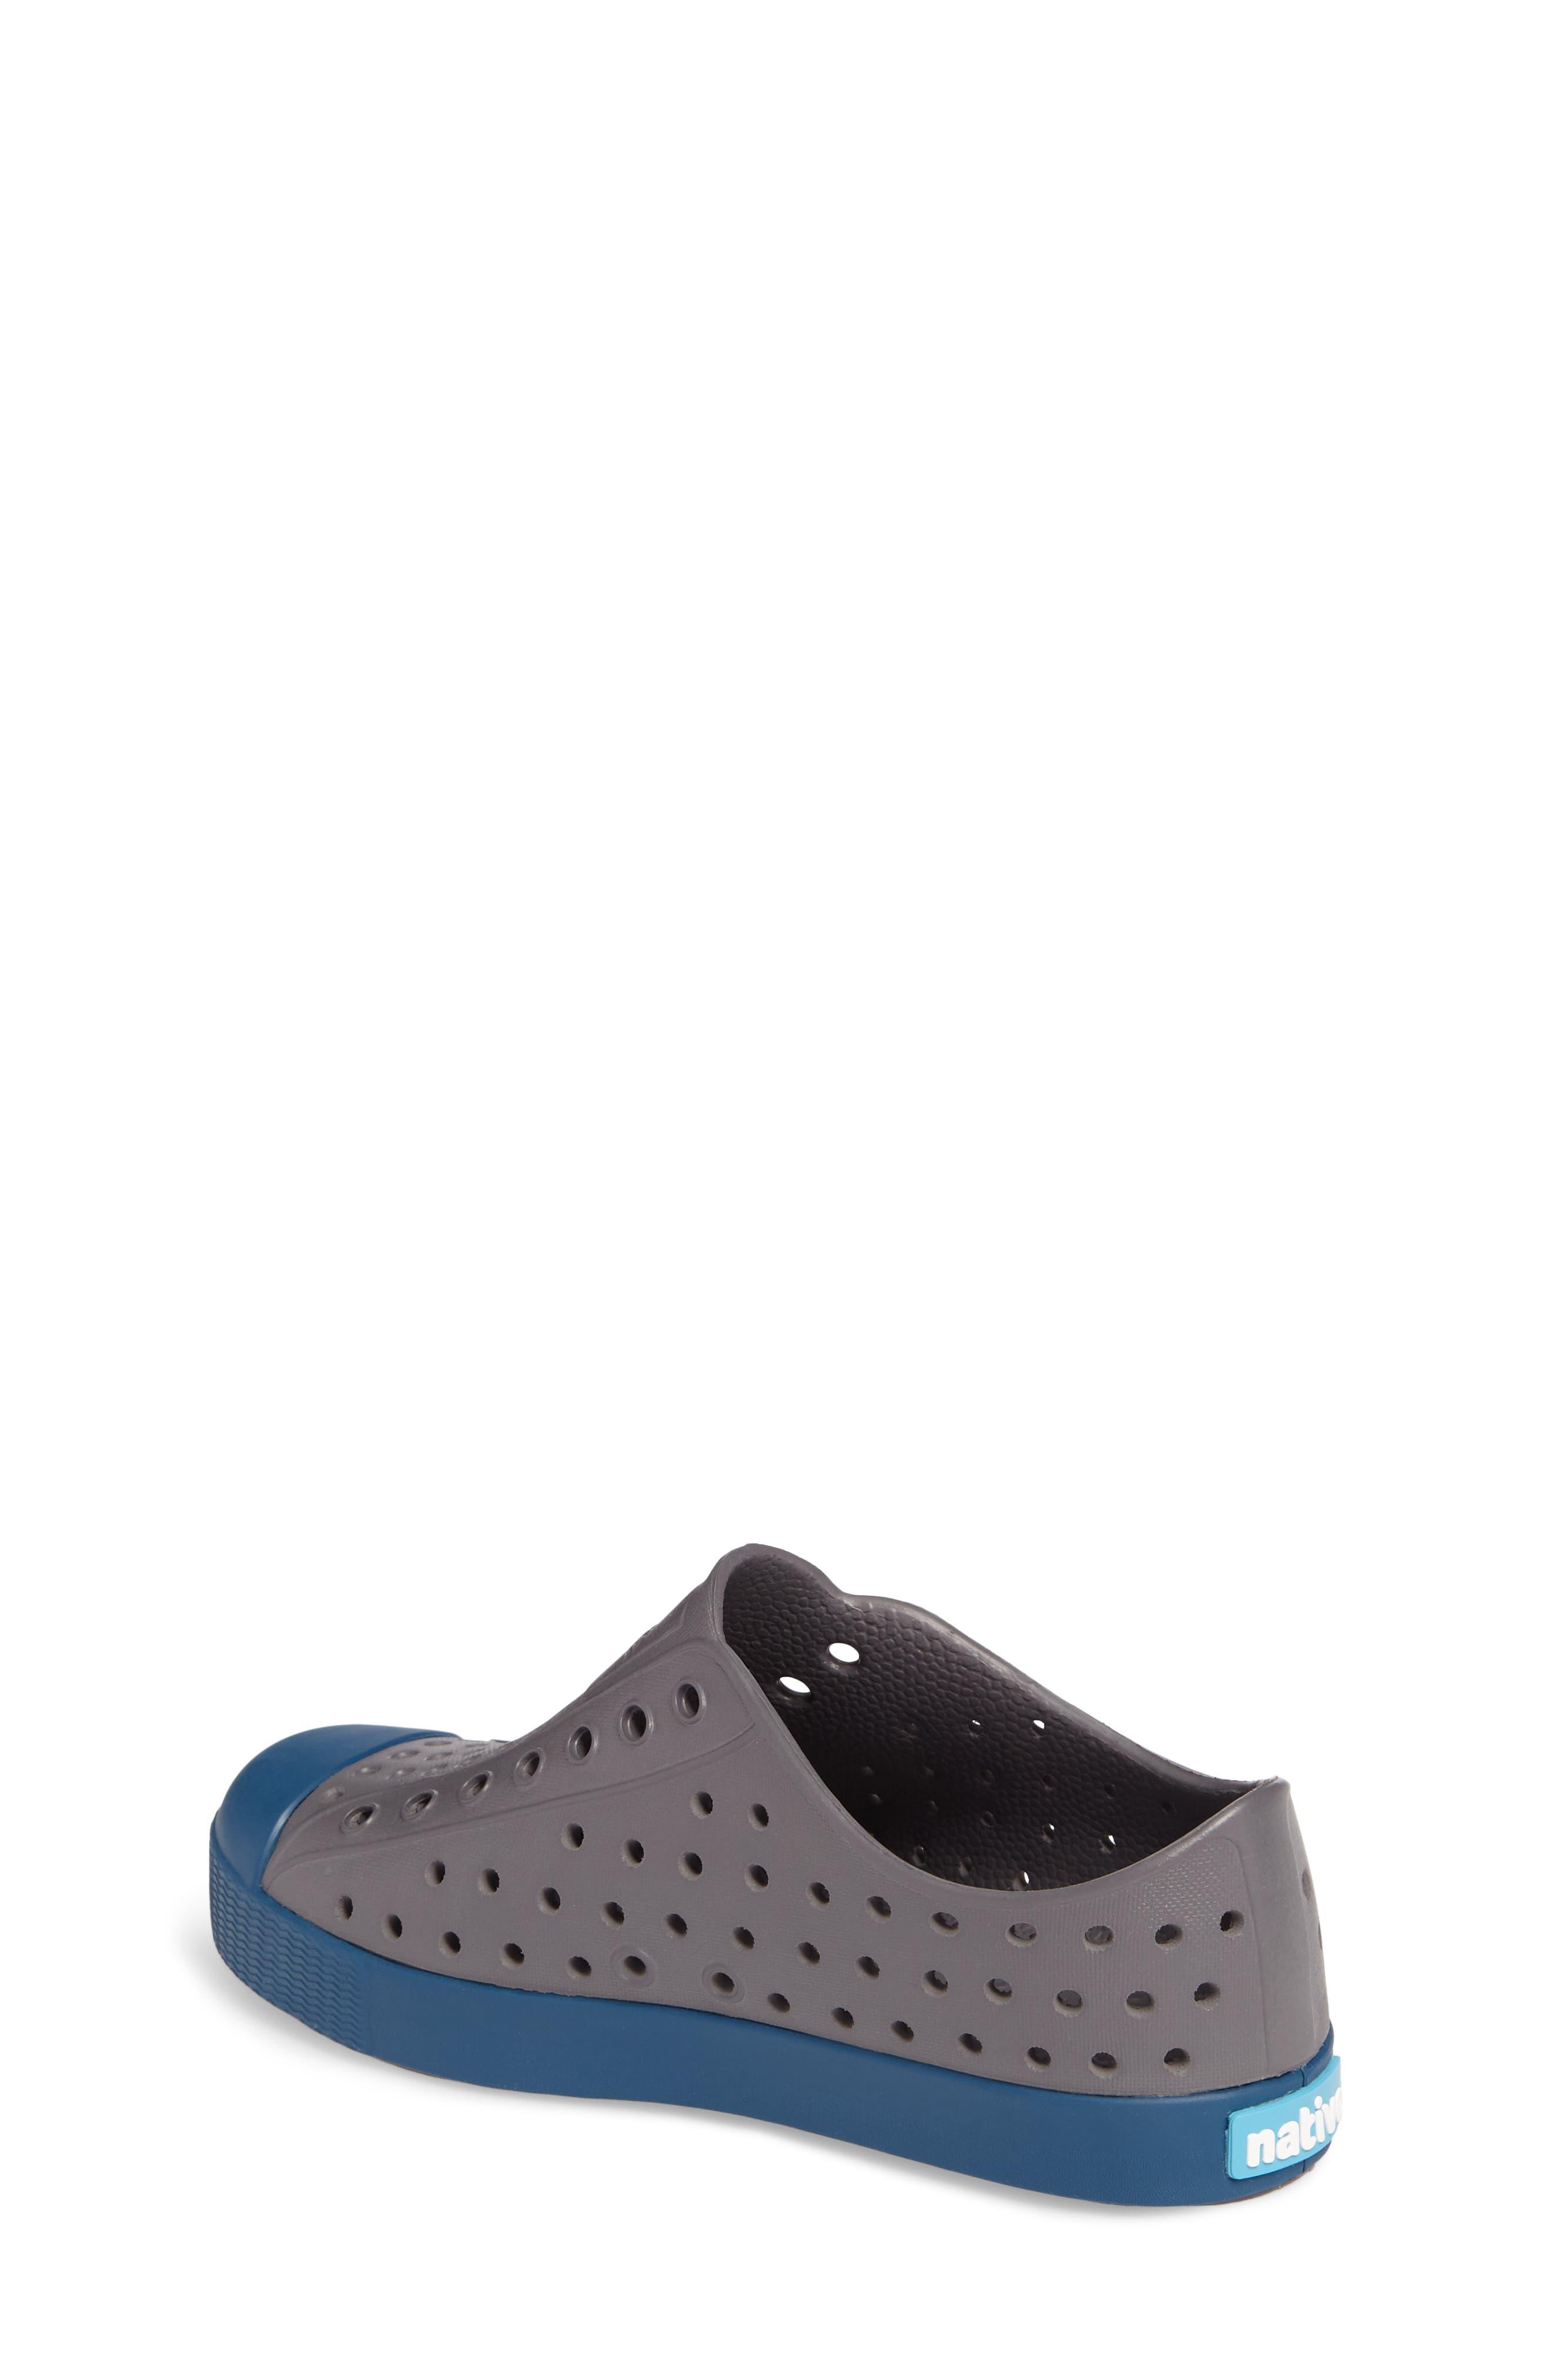 'Jefferson' Water Friendly Slip-On Sneaker,                             Alternate thumbnail 90, color,